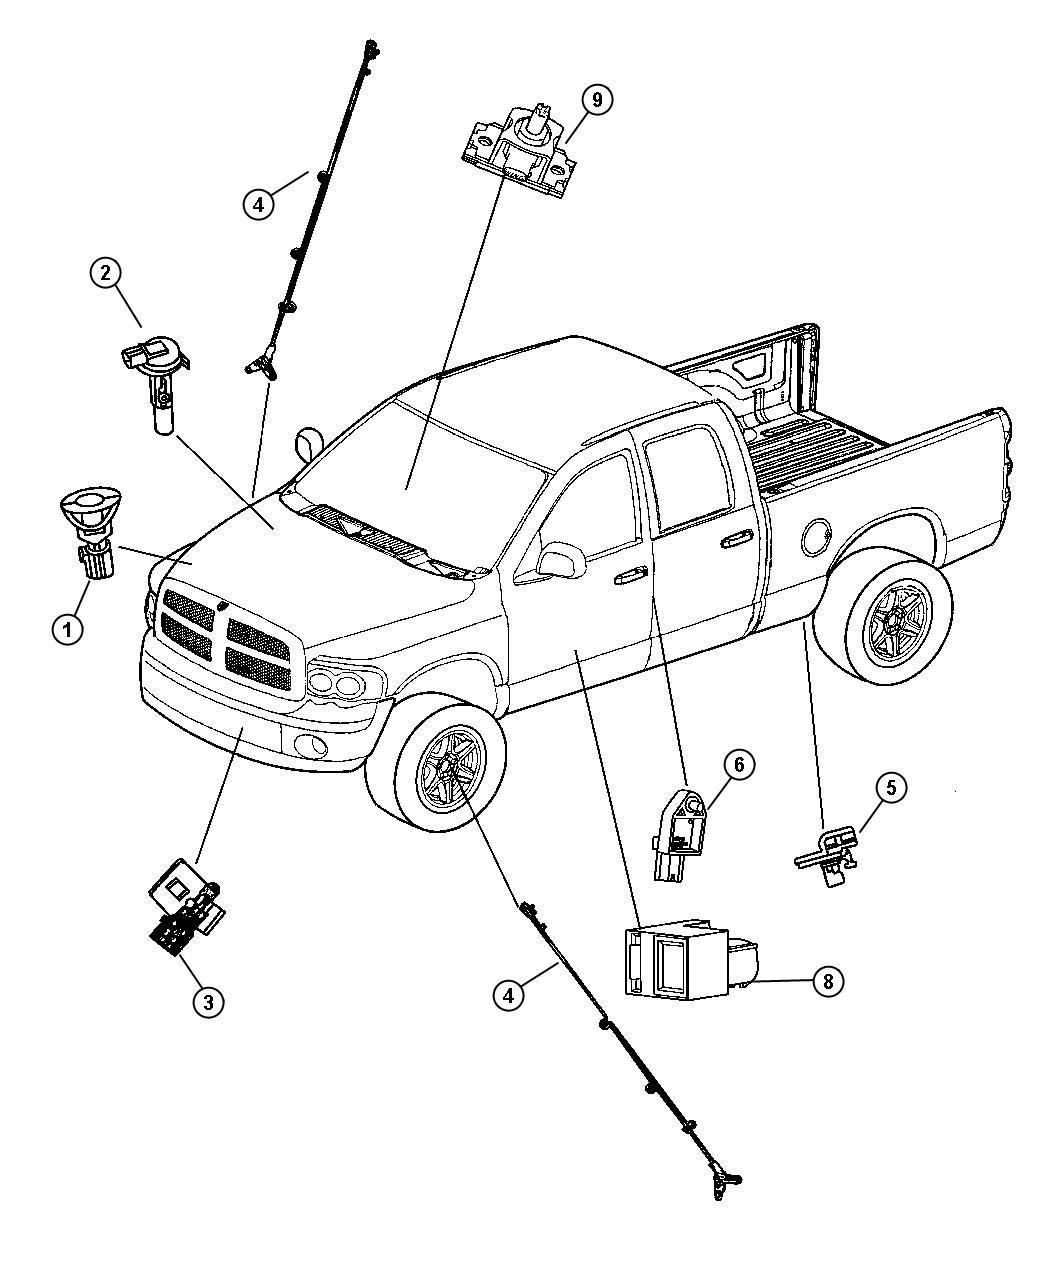 Dodge Ram Slt Quad Cab 5 7l Hemi V8 A T 4x2